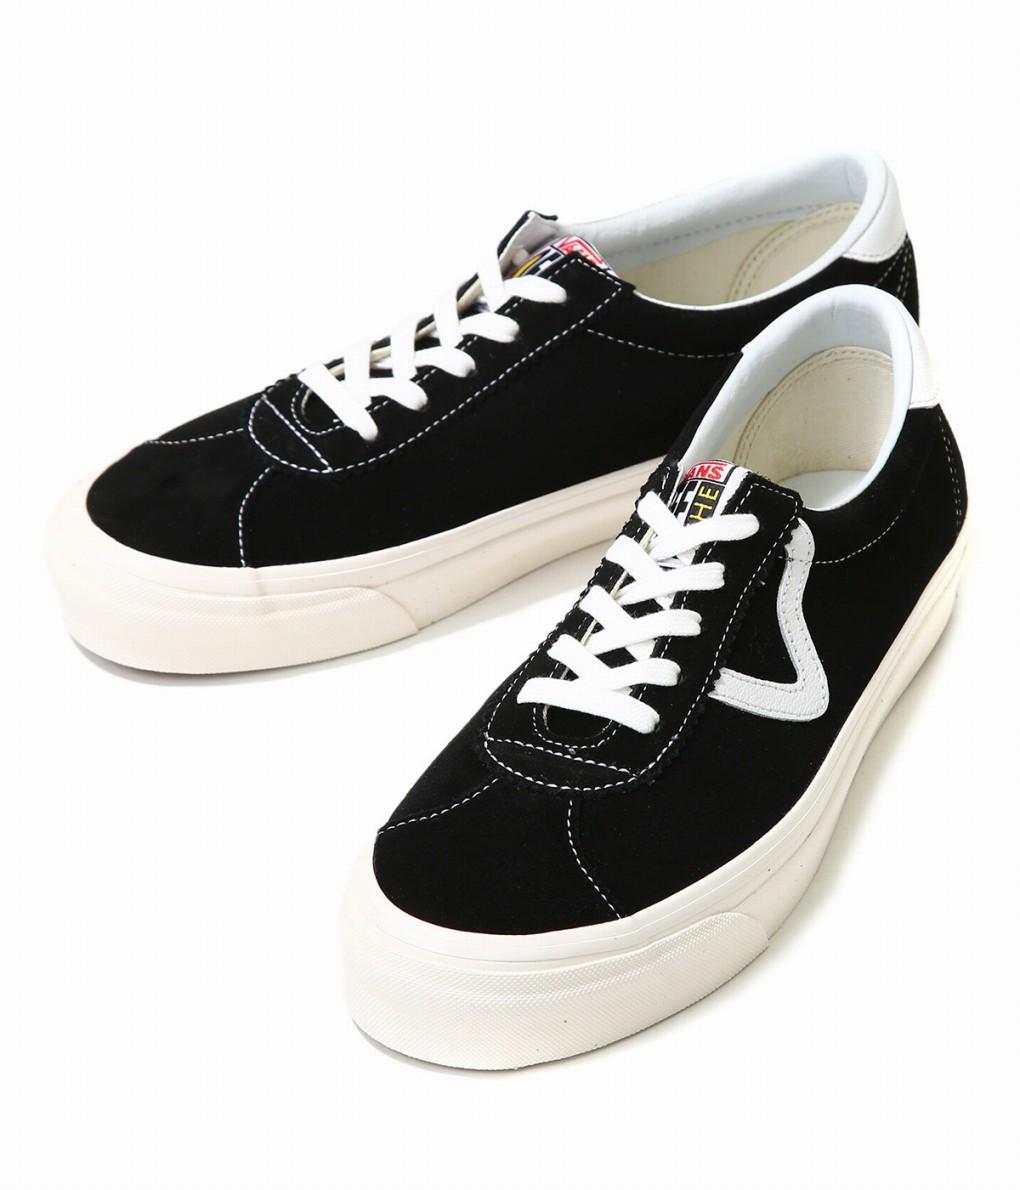 VANS CLASSICS / バンズ クラシック : STYLE 73 DX -ANAHEIM FACTORY- : ヴァンズ スニーカー メンズ 靴 シューズ : VN0A3WLQUL1 【PIE】